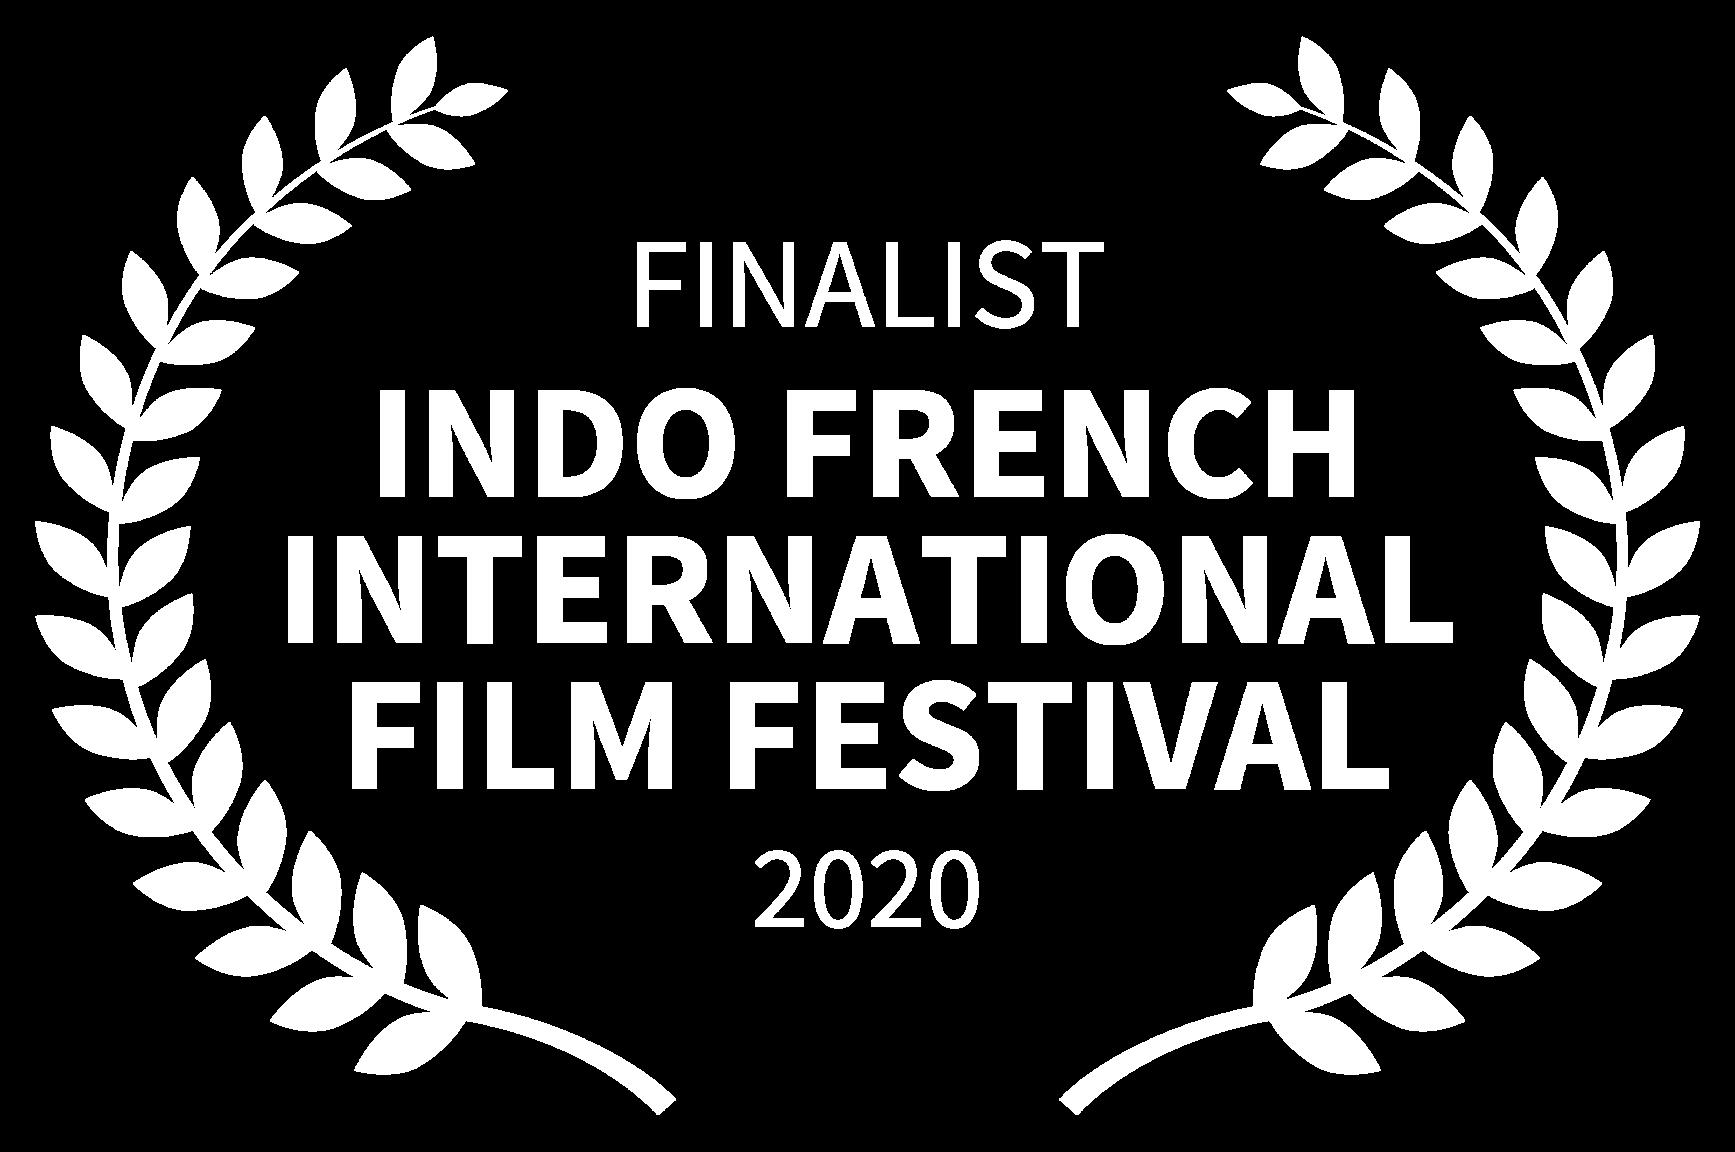 FINALIST - INDO FRENCH INTERNATIONAL FILM FESTIVAL - 2020